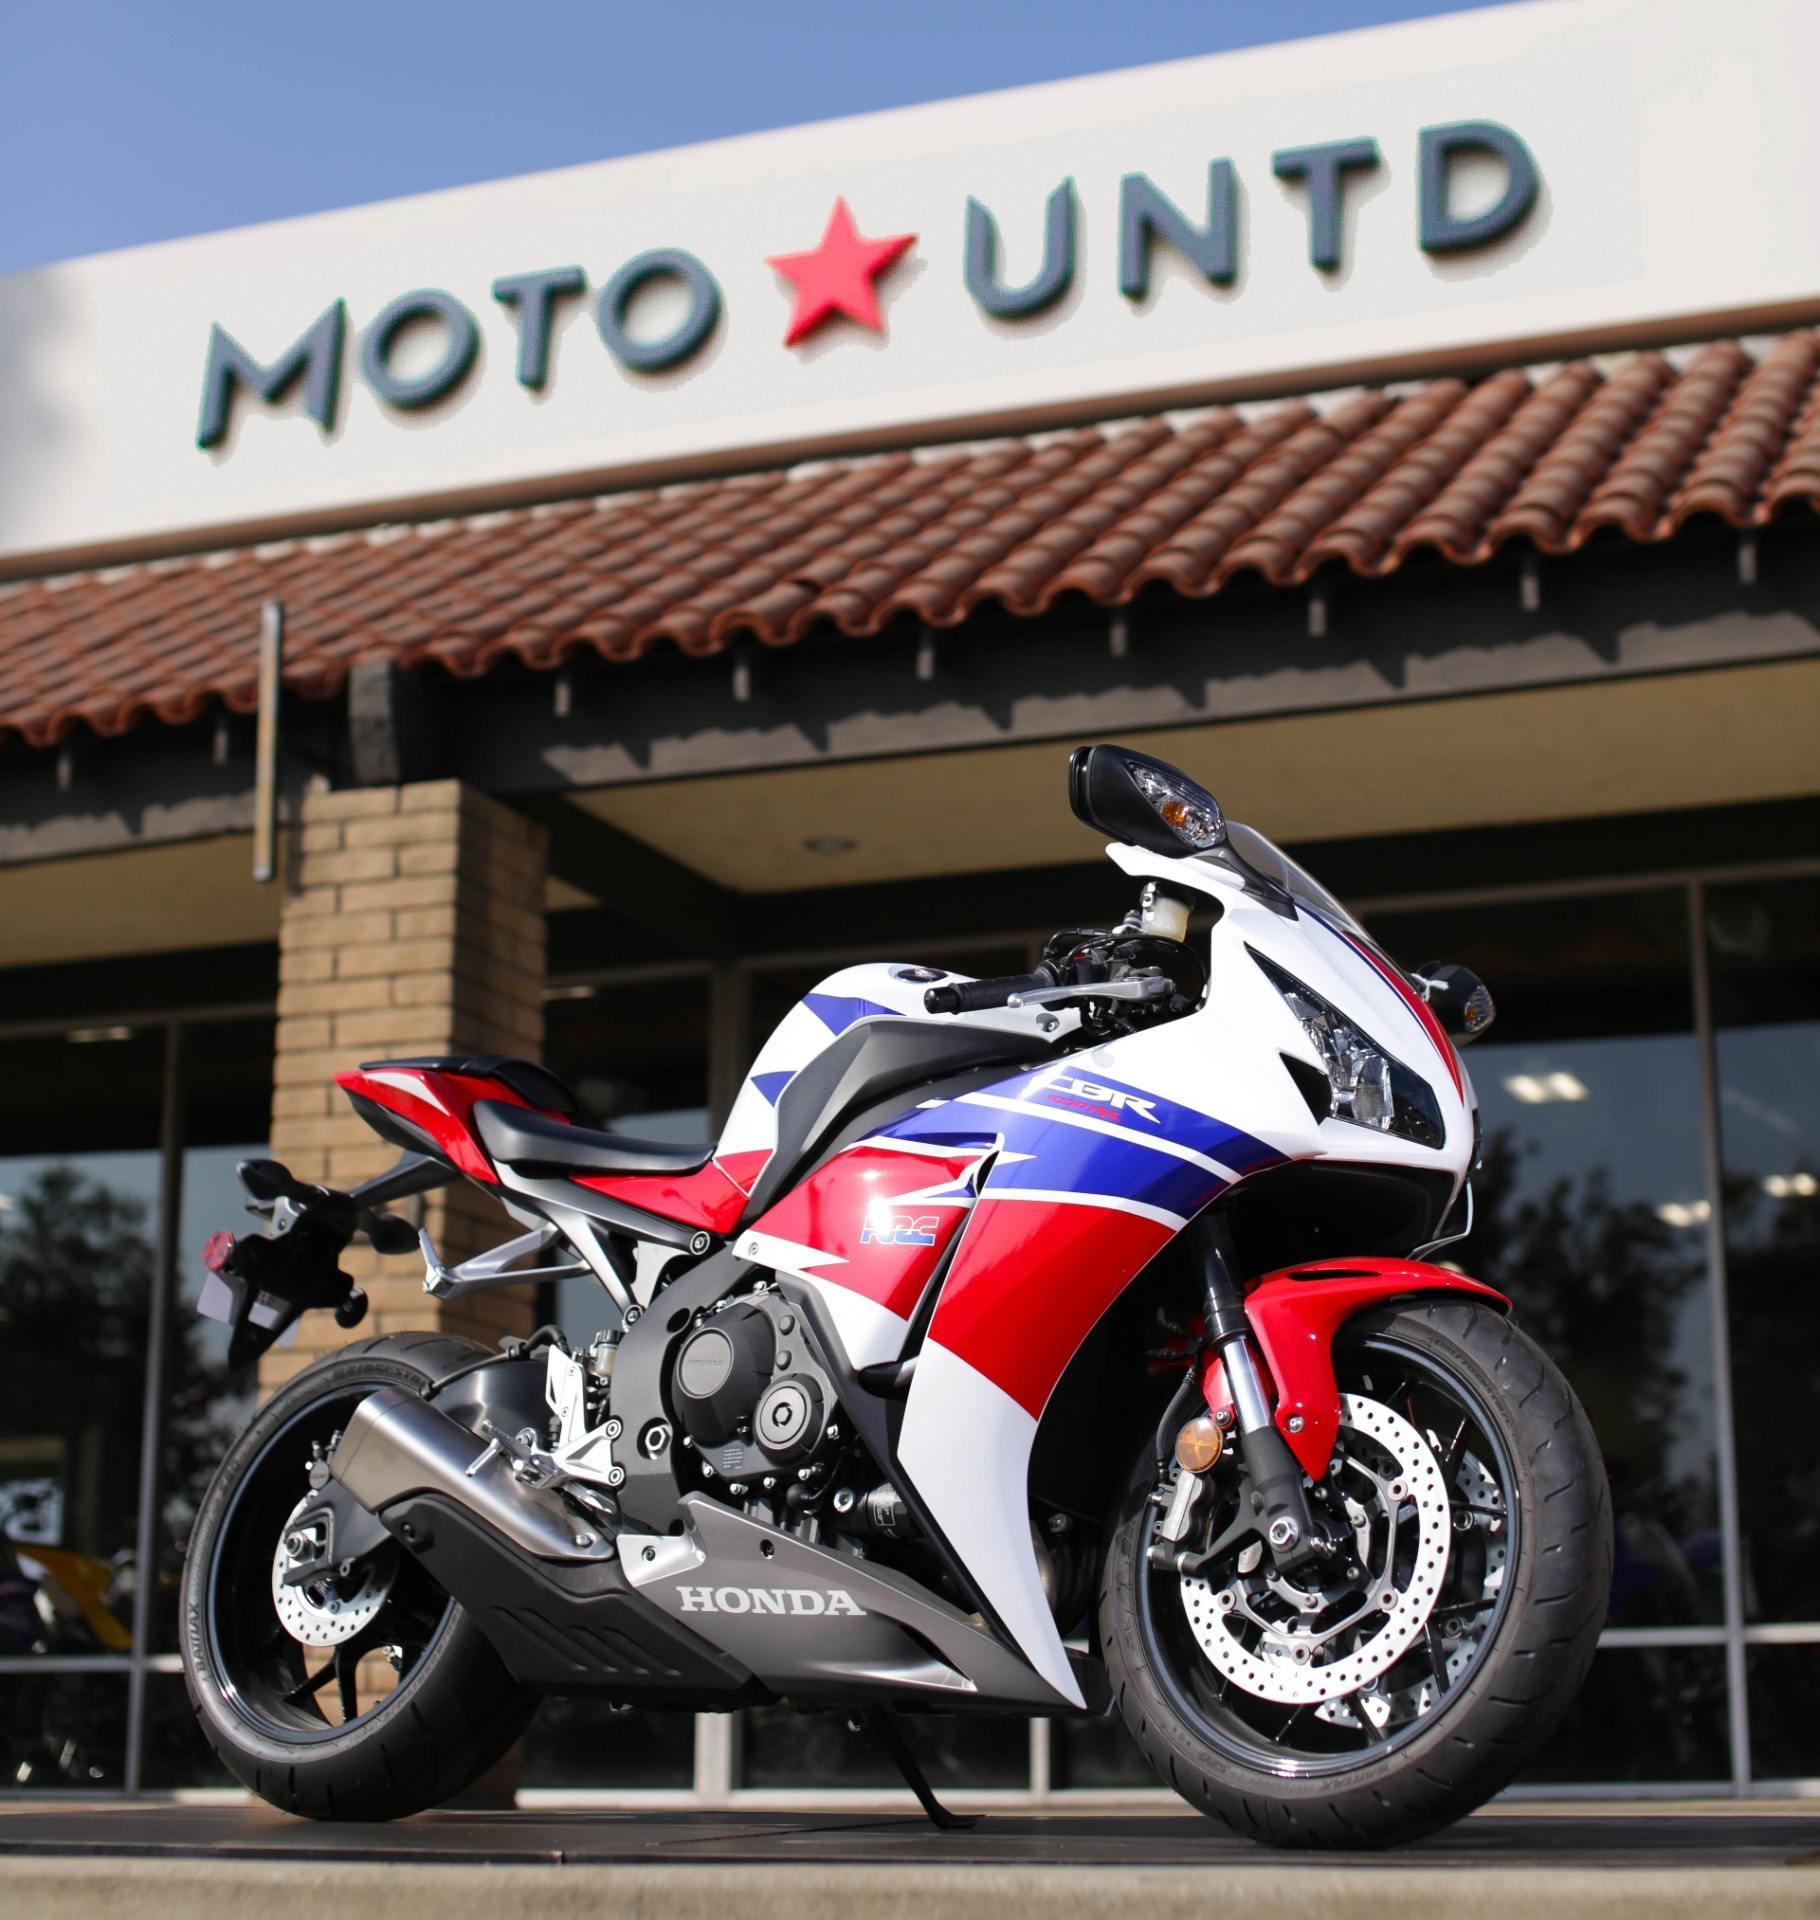 2015 Honda CBR®1000RR in La Habra, California